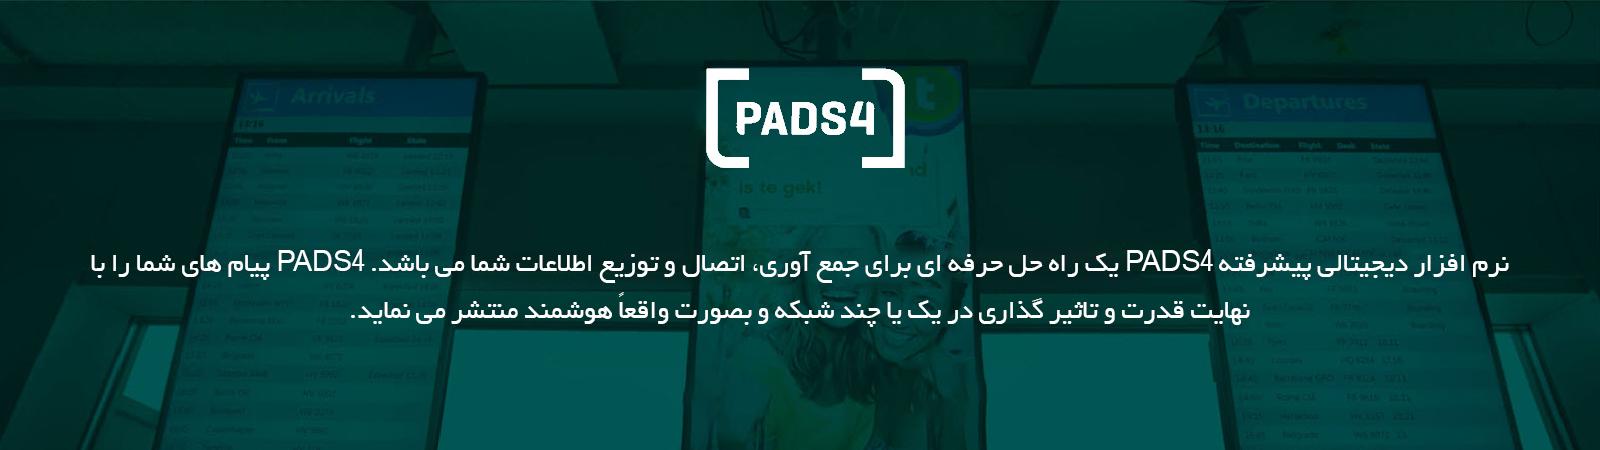 padss